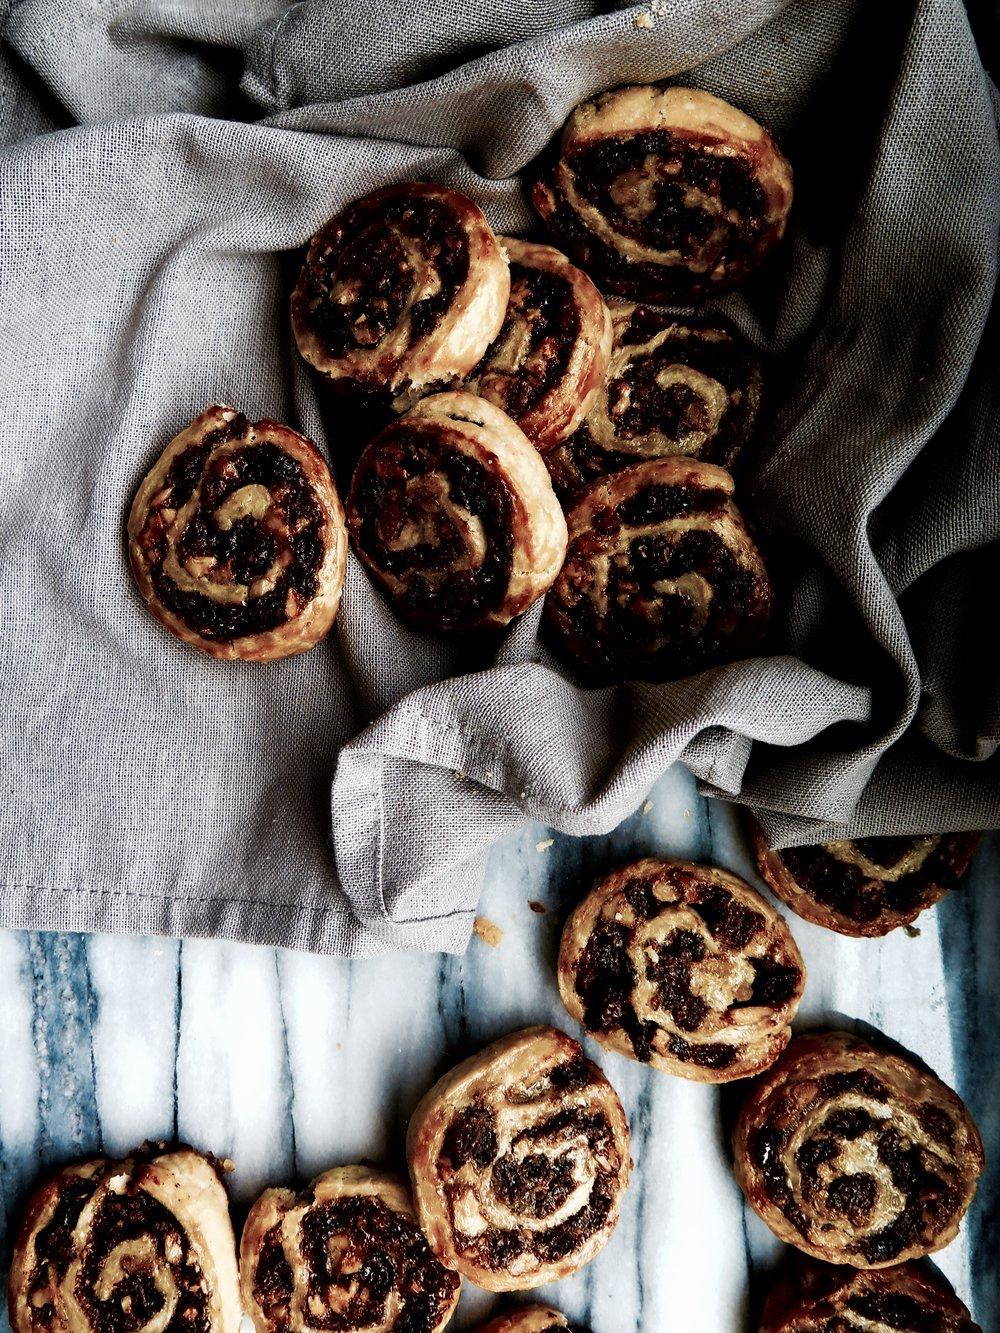 Cinnamon, Sultana & Apricot Swirl Cookies